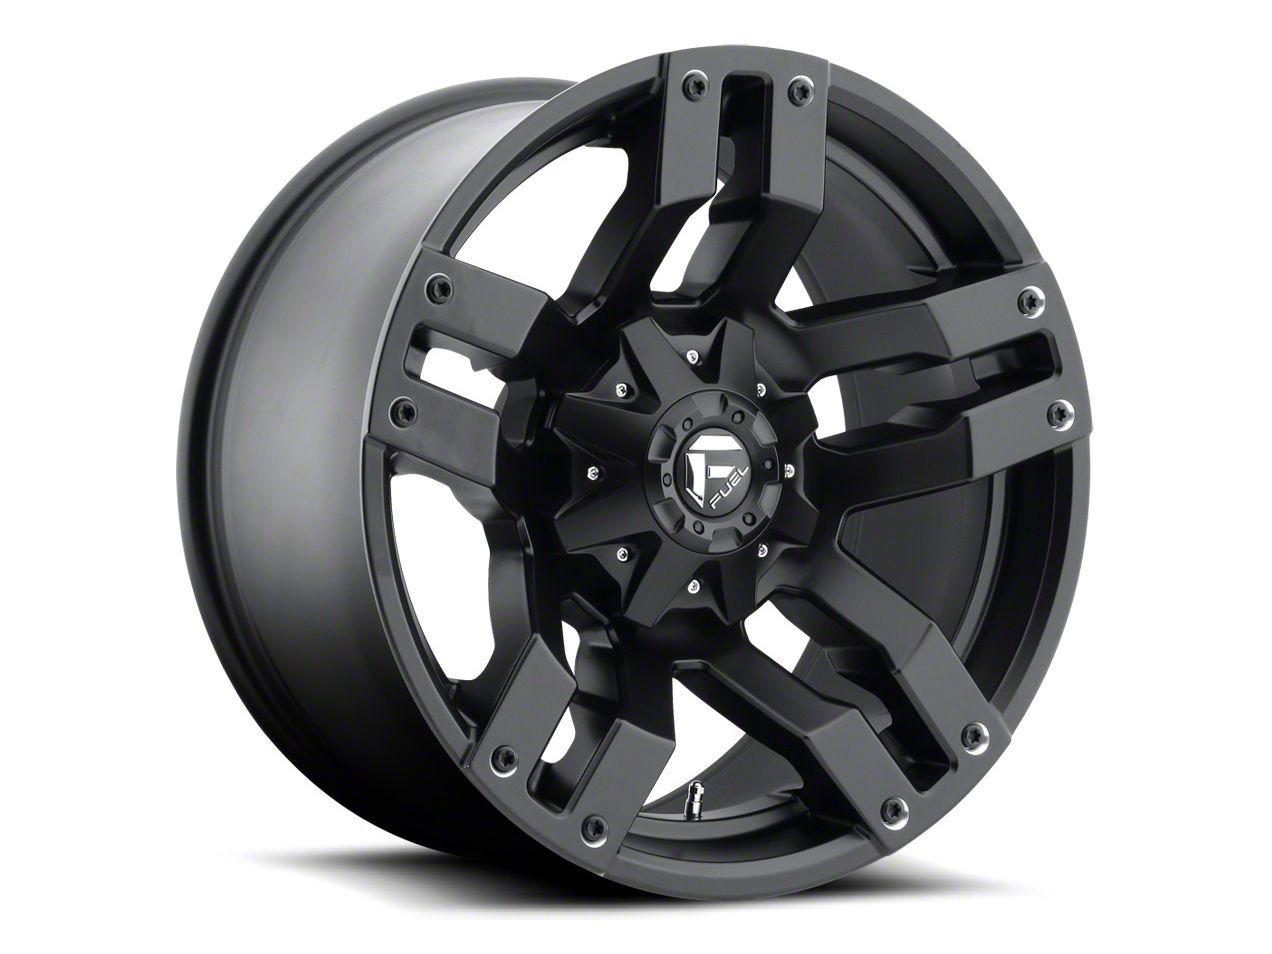 Fuel Wheels Pump Matte Black 6-Lug Wheel - 20x10 (07-18 Sierra 1500)